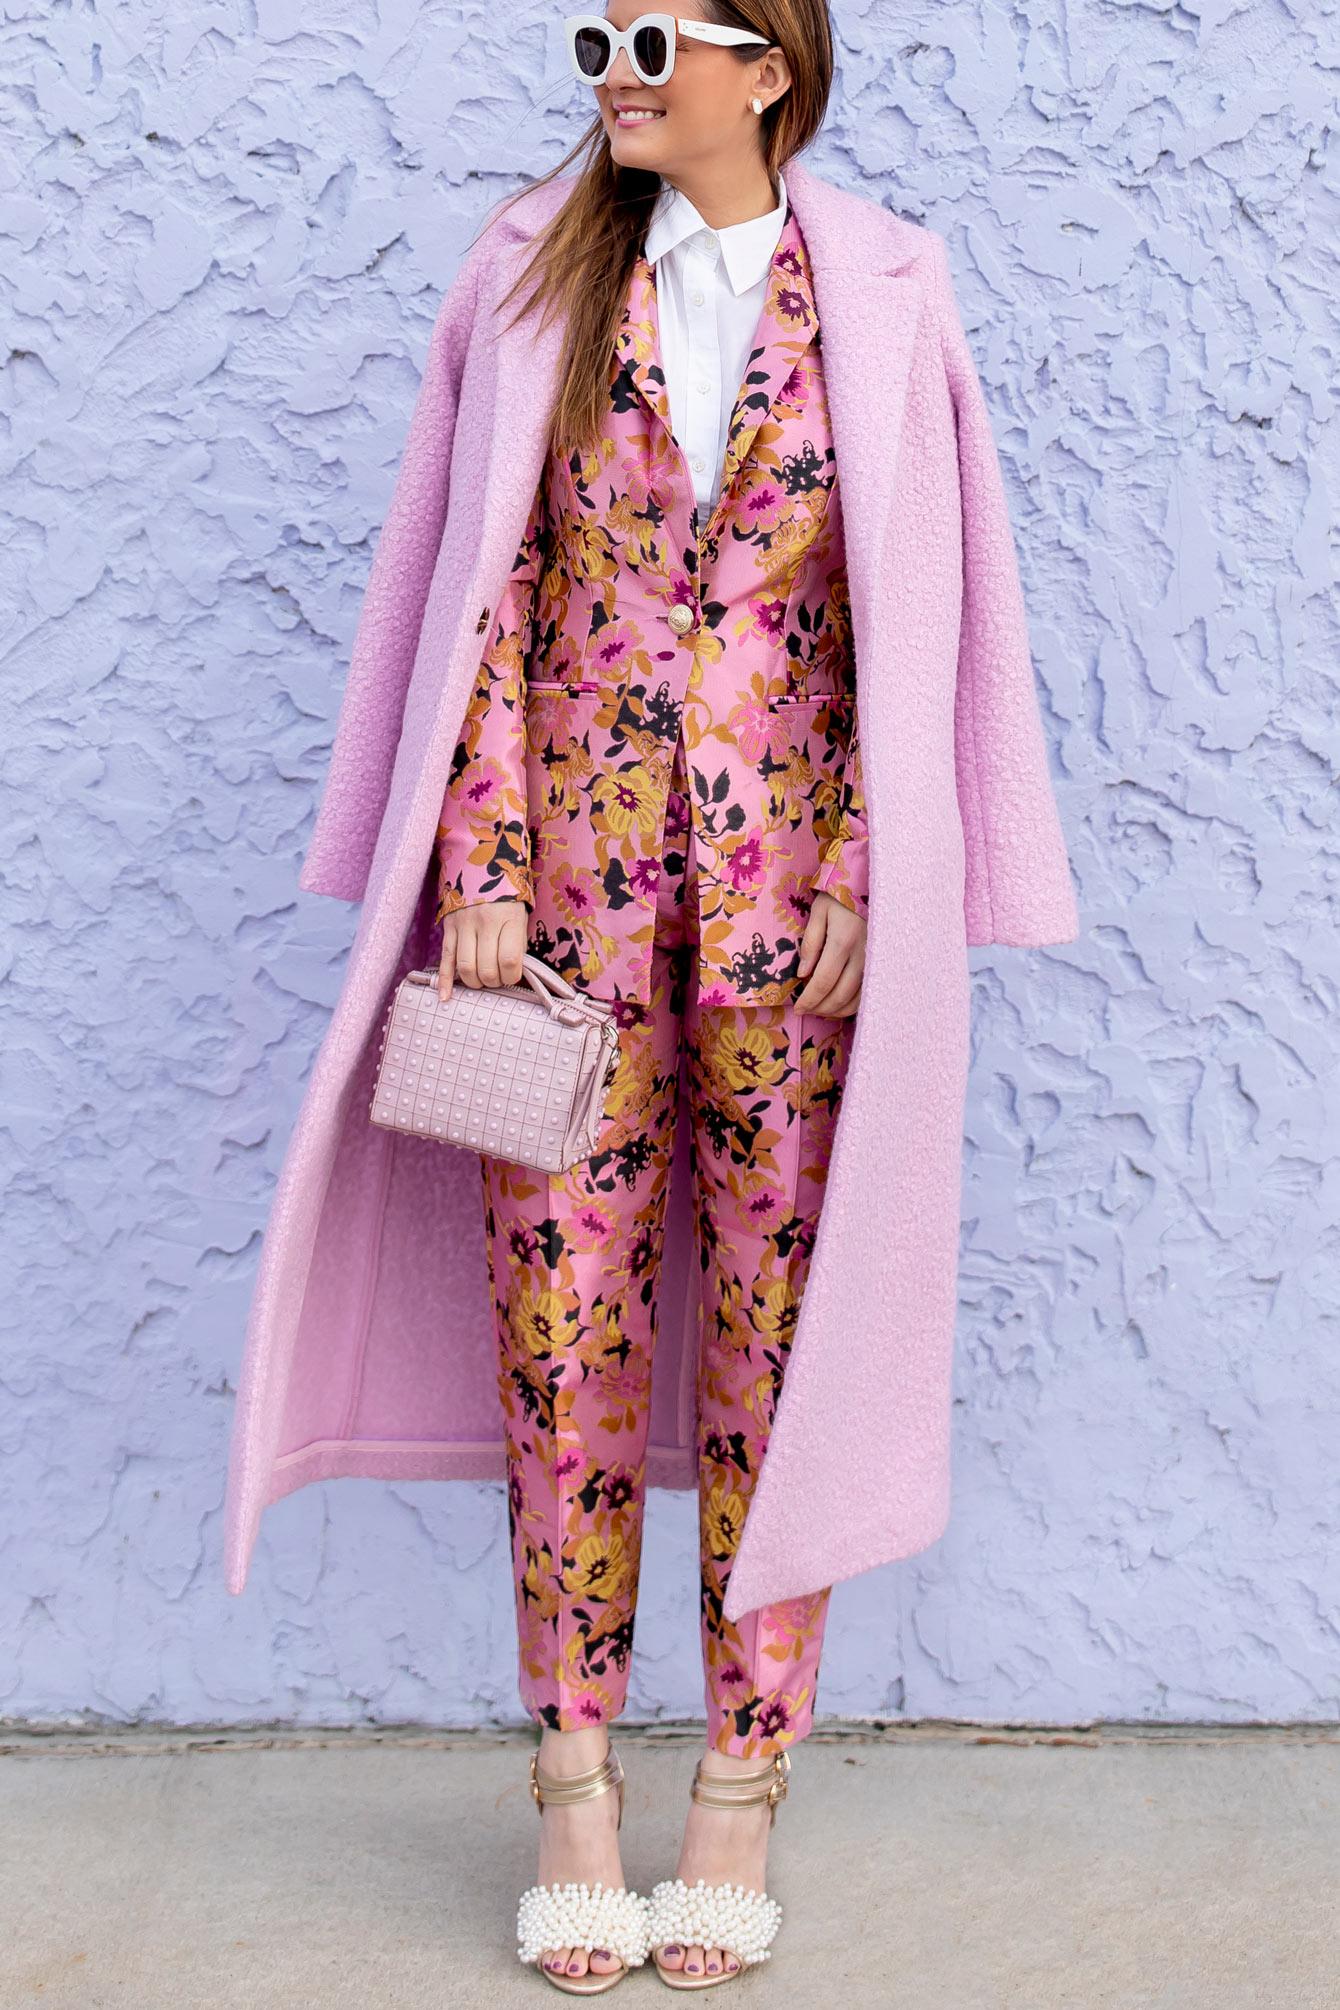 River Island Pink Long Coat